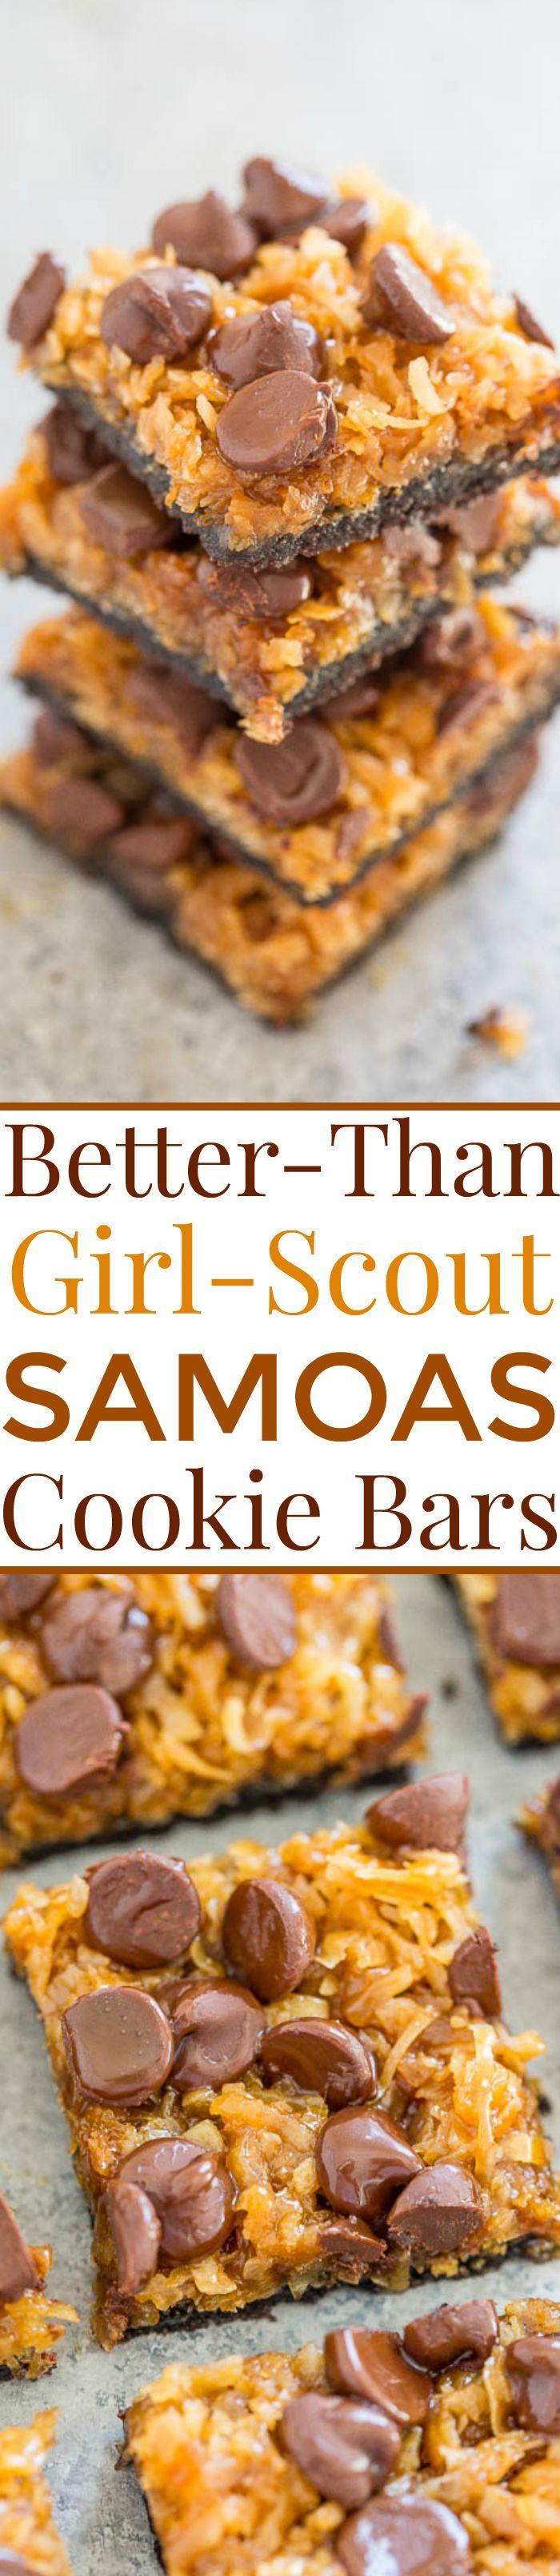 Better-Than-Girl-Scout Samoas Cookie Bars - Averie Cooks